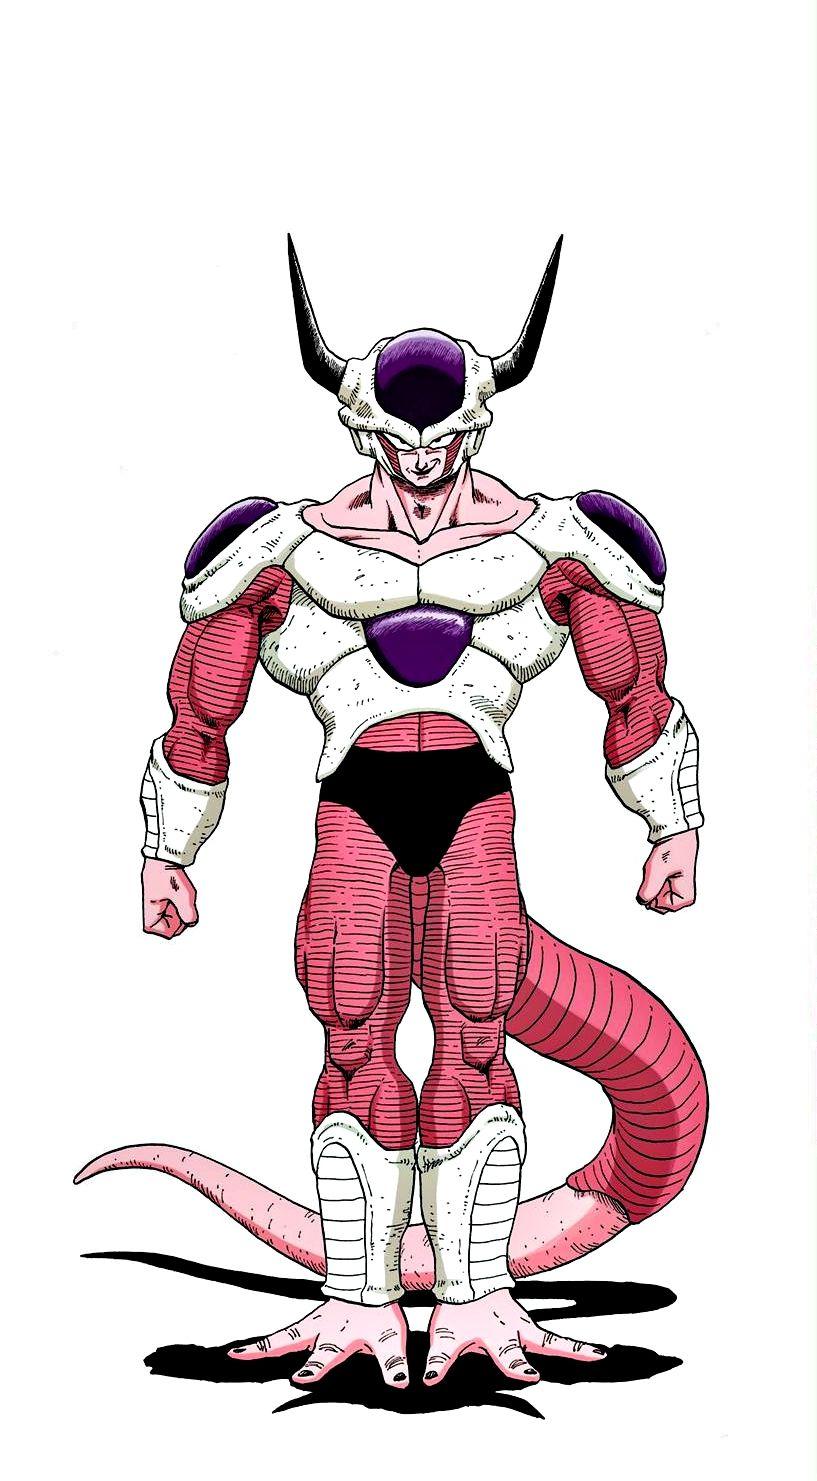 Freezer Second Form | DBZ | Pinterest | Dragon ball, Dragones y Goku